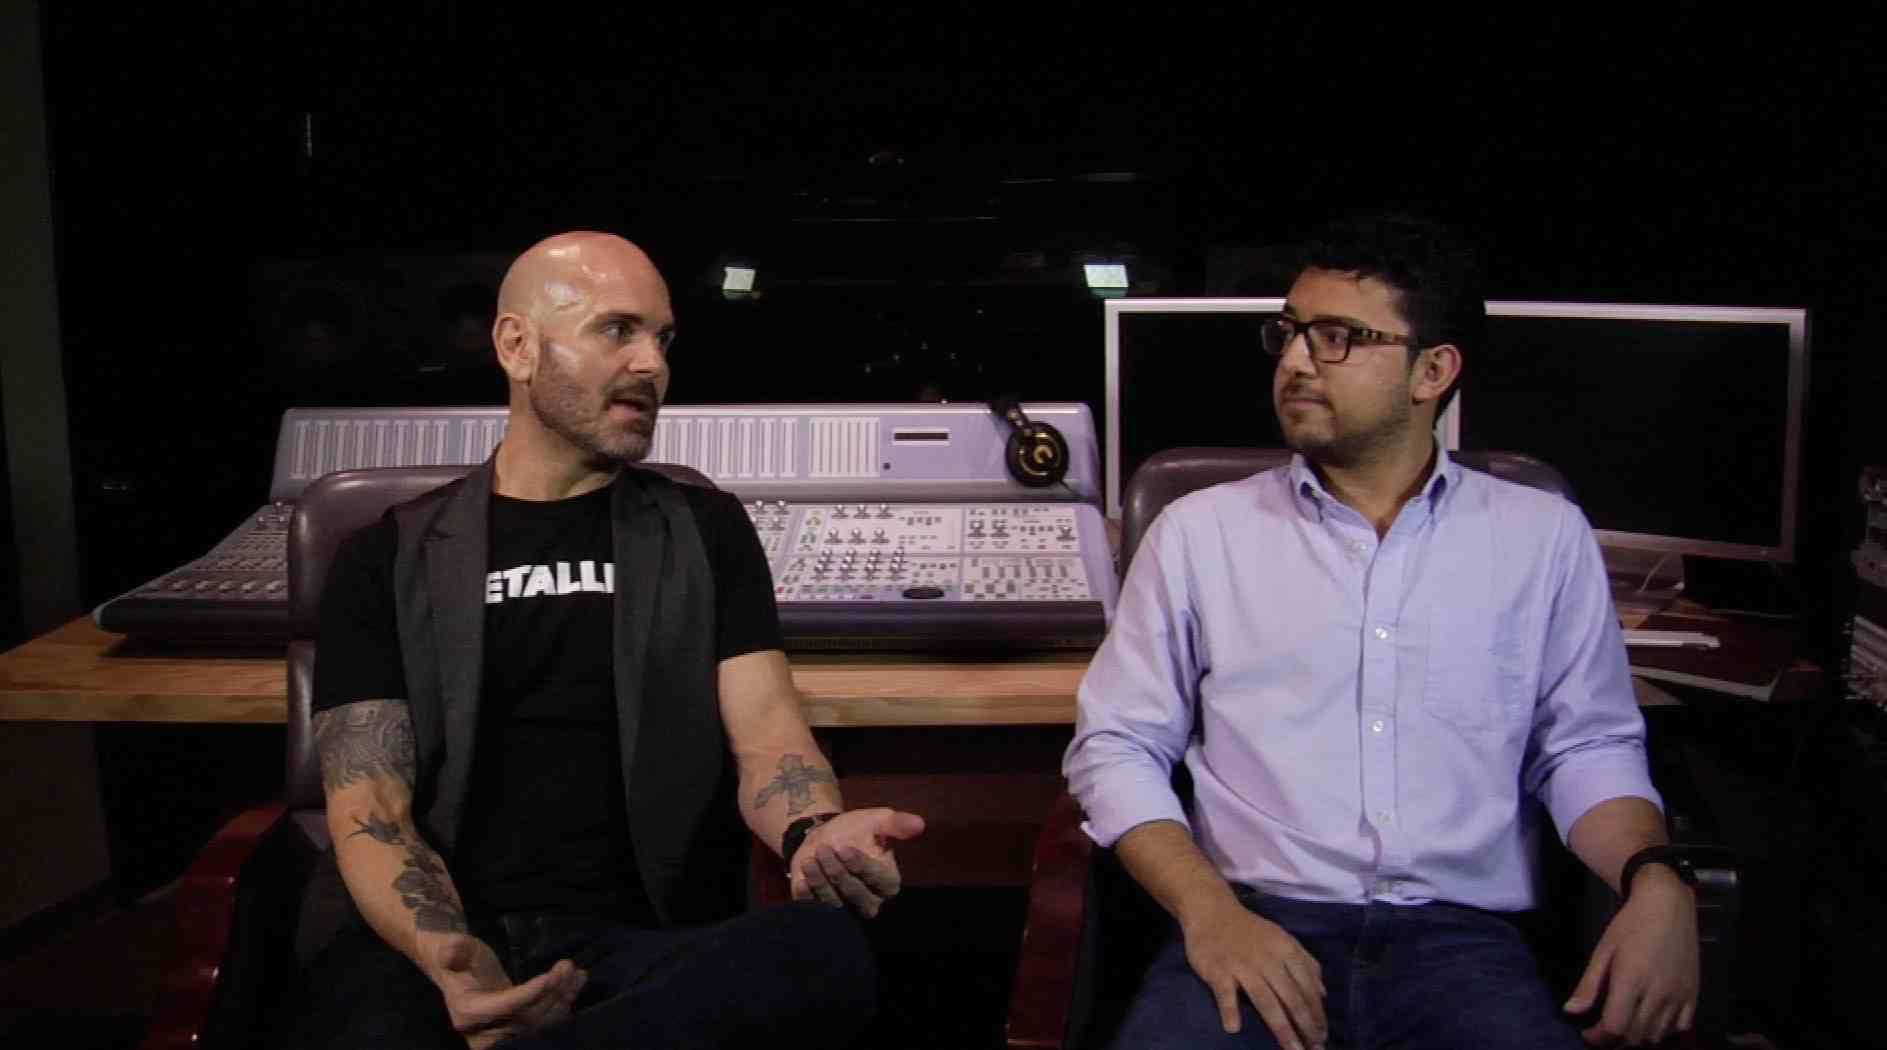 Roddy and Logan discuss video marketing basics